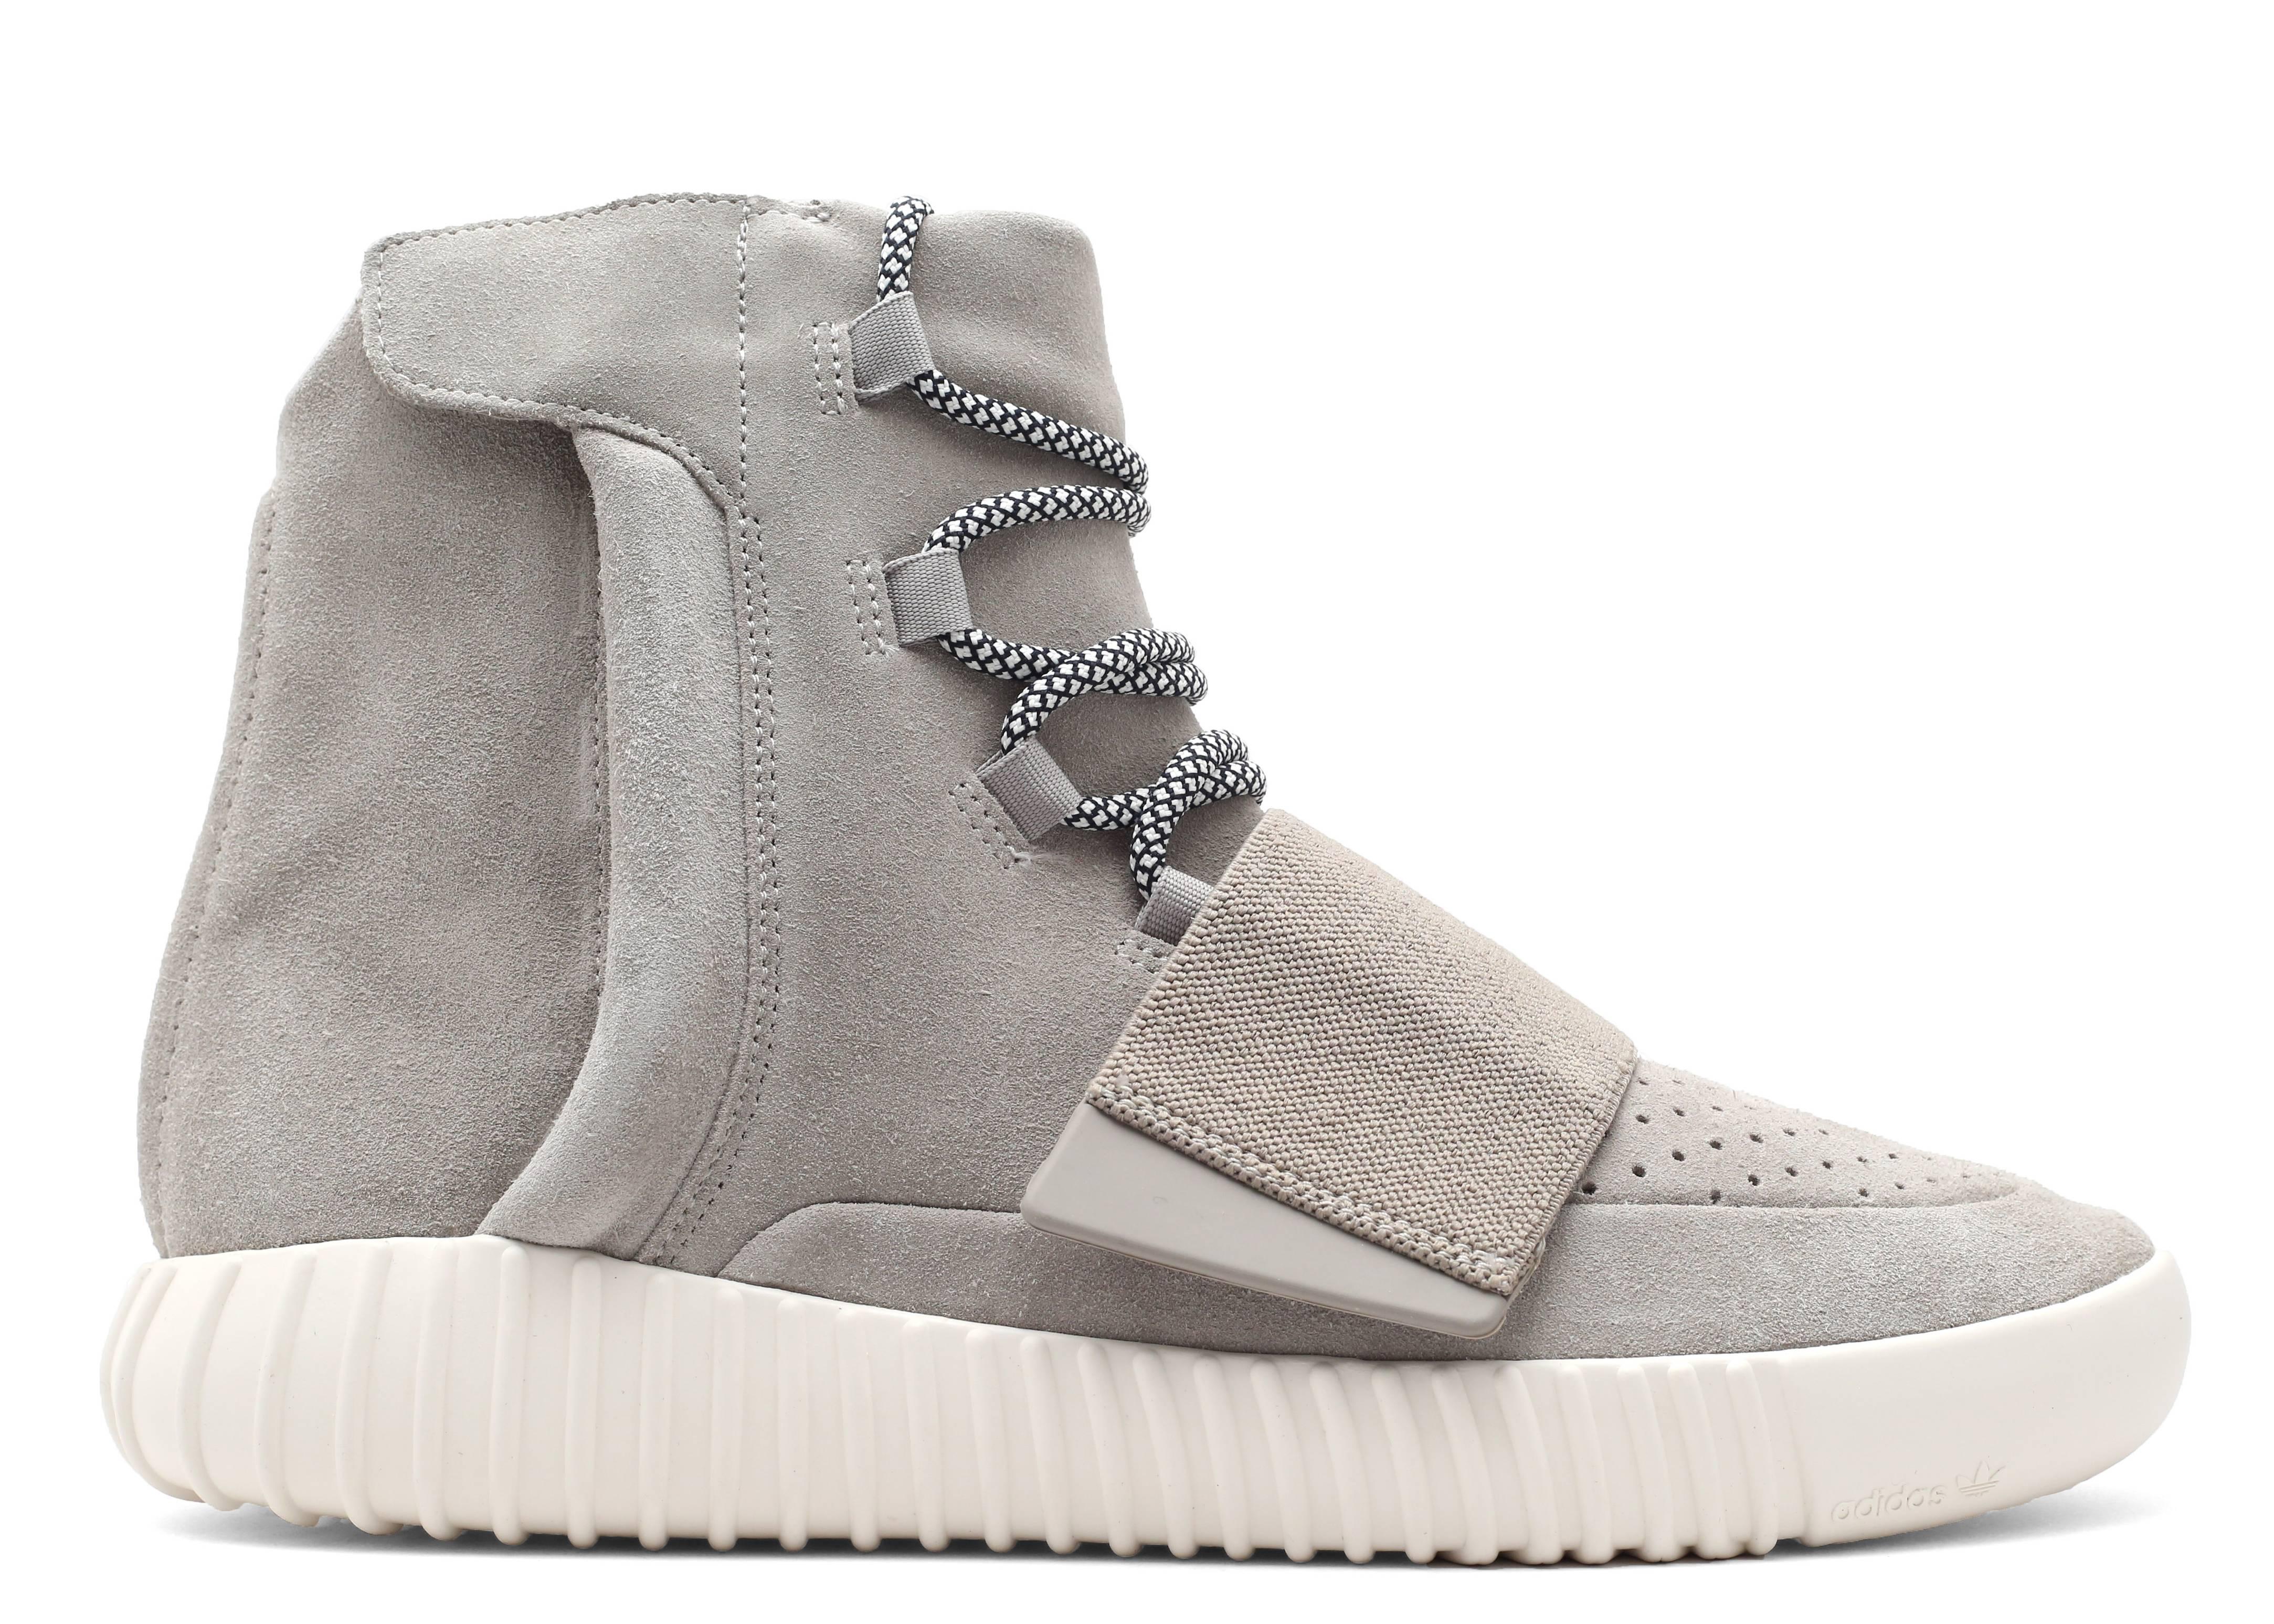 Yeezy Boost 750 'OG' - Adidas - B35309 - light brown/carbon white ...